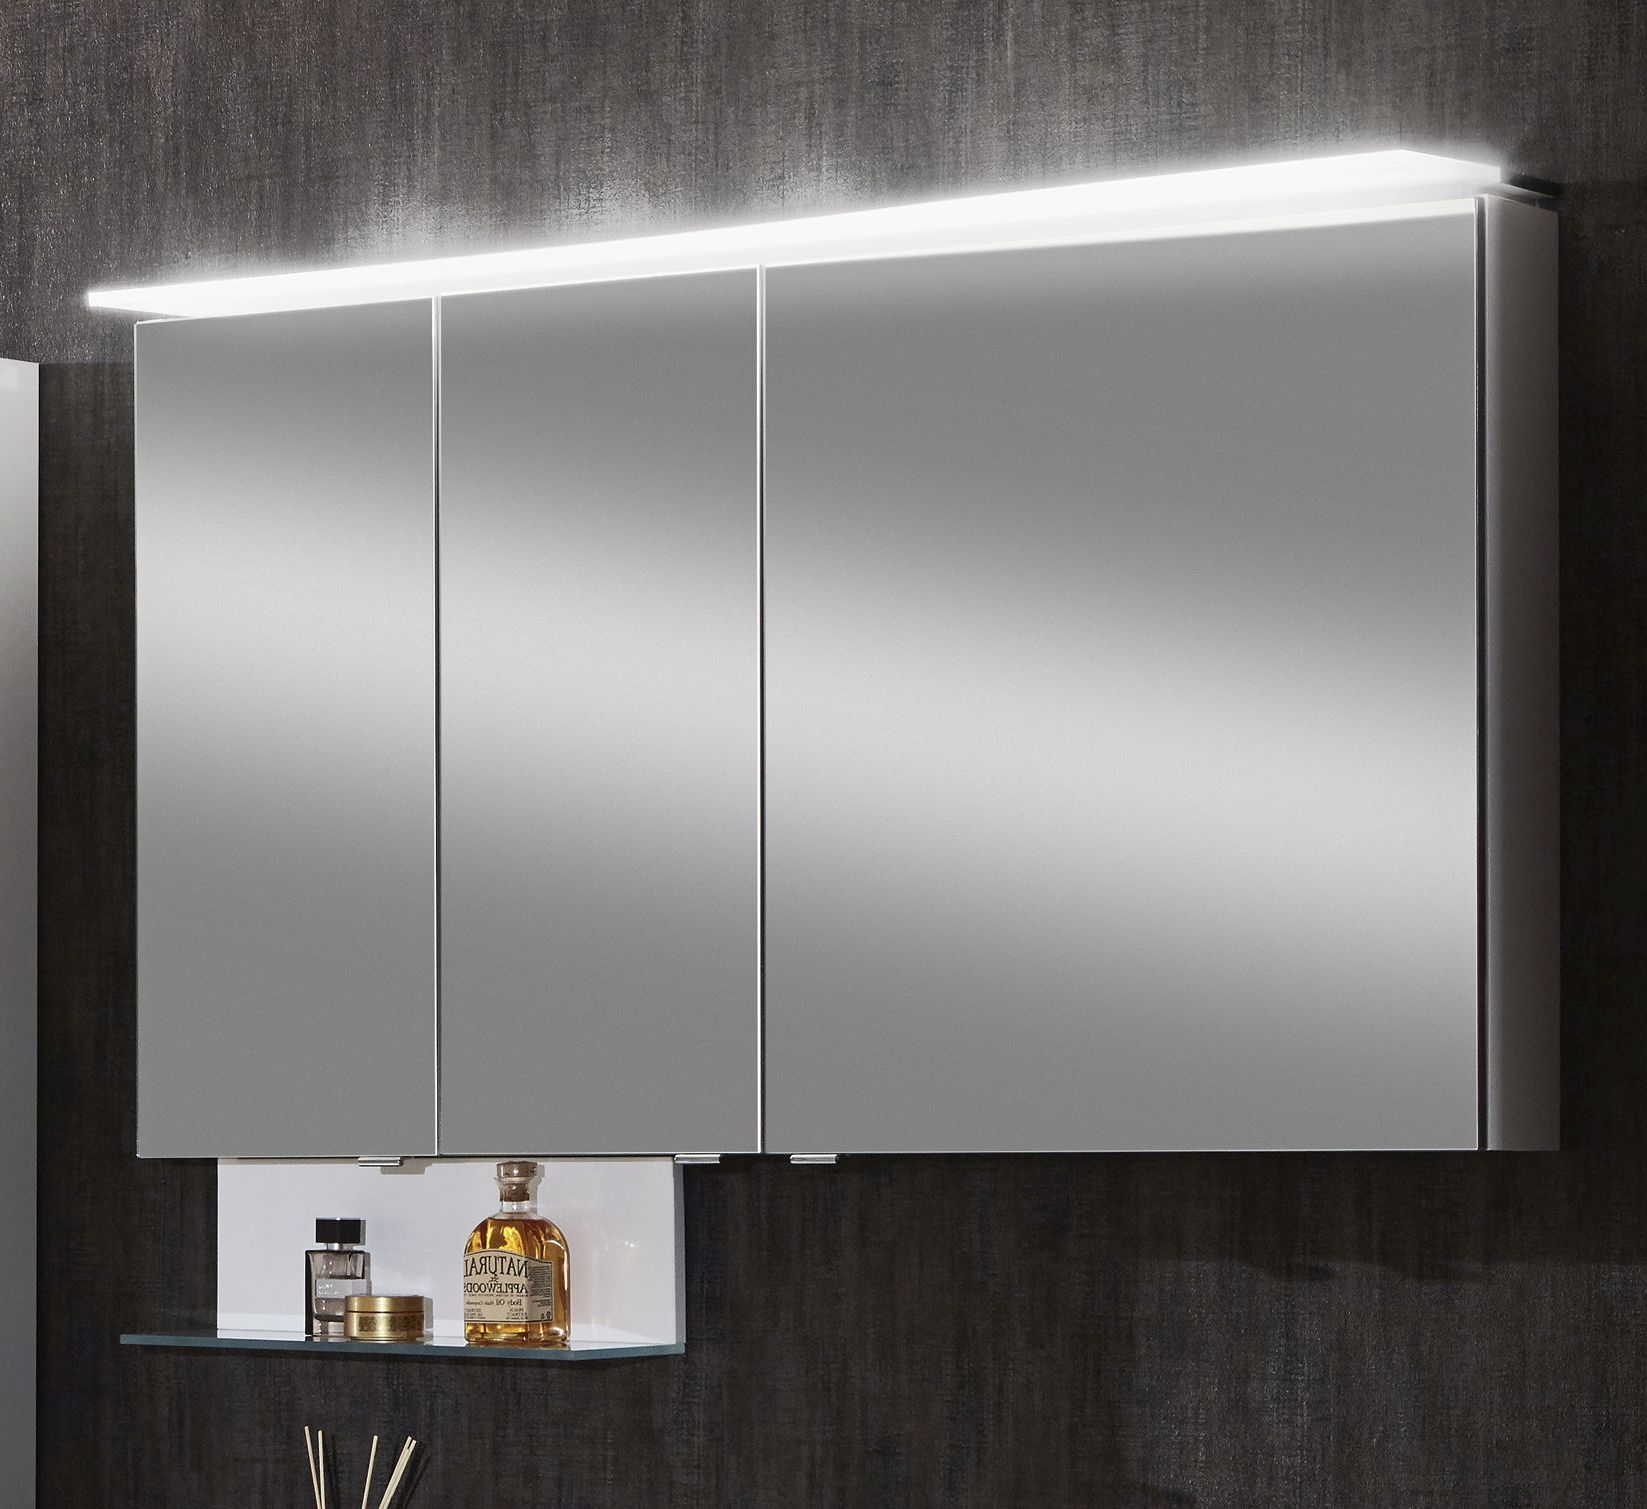 marlin bad 3160 motion spiegelschrank 120 cm saos336 saoz336 g nstig kaufen m bel universum. Black Bedroom Furniture Sets. Home Design Ideas